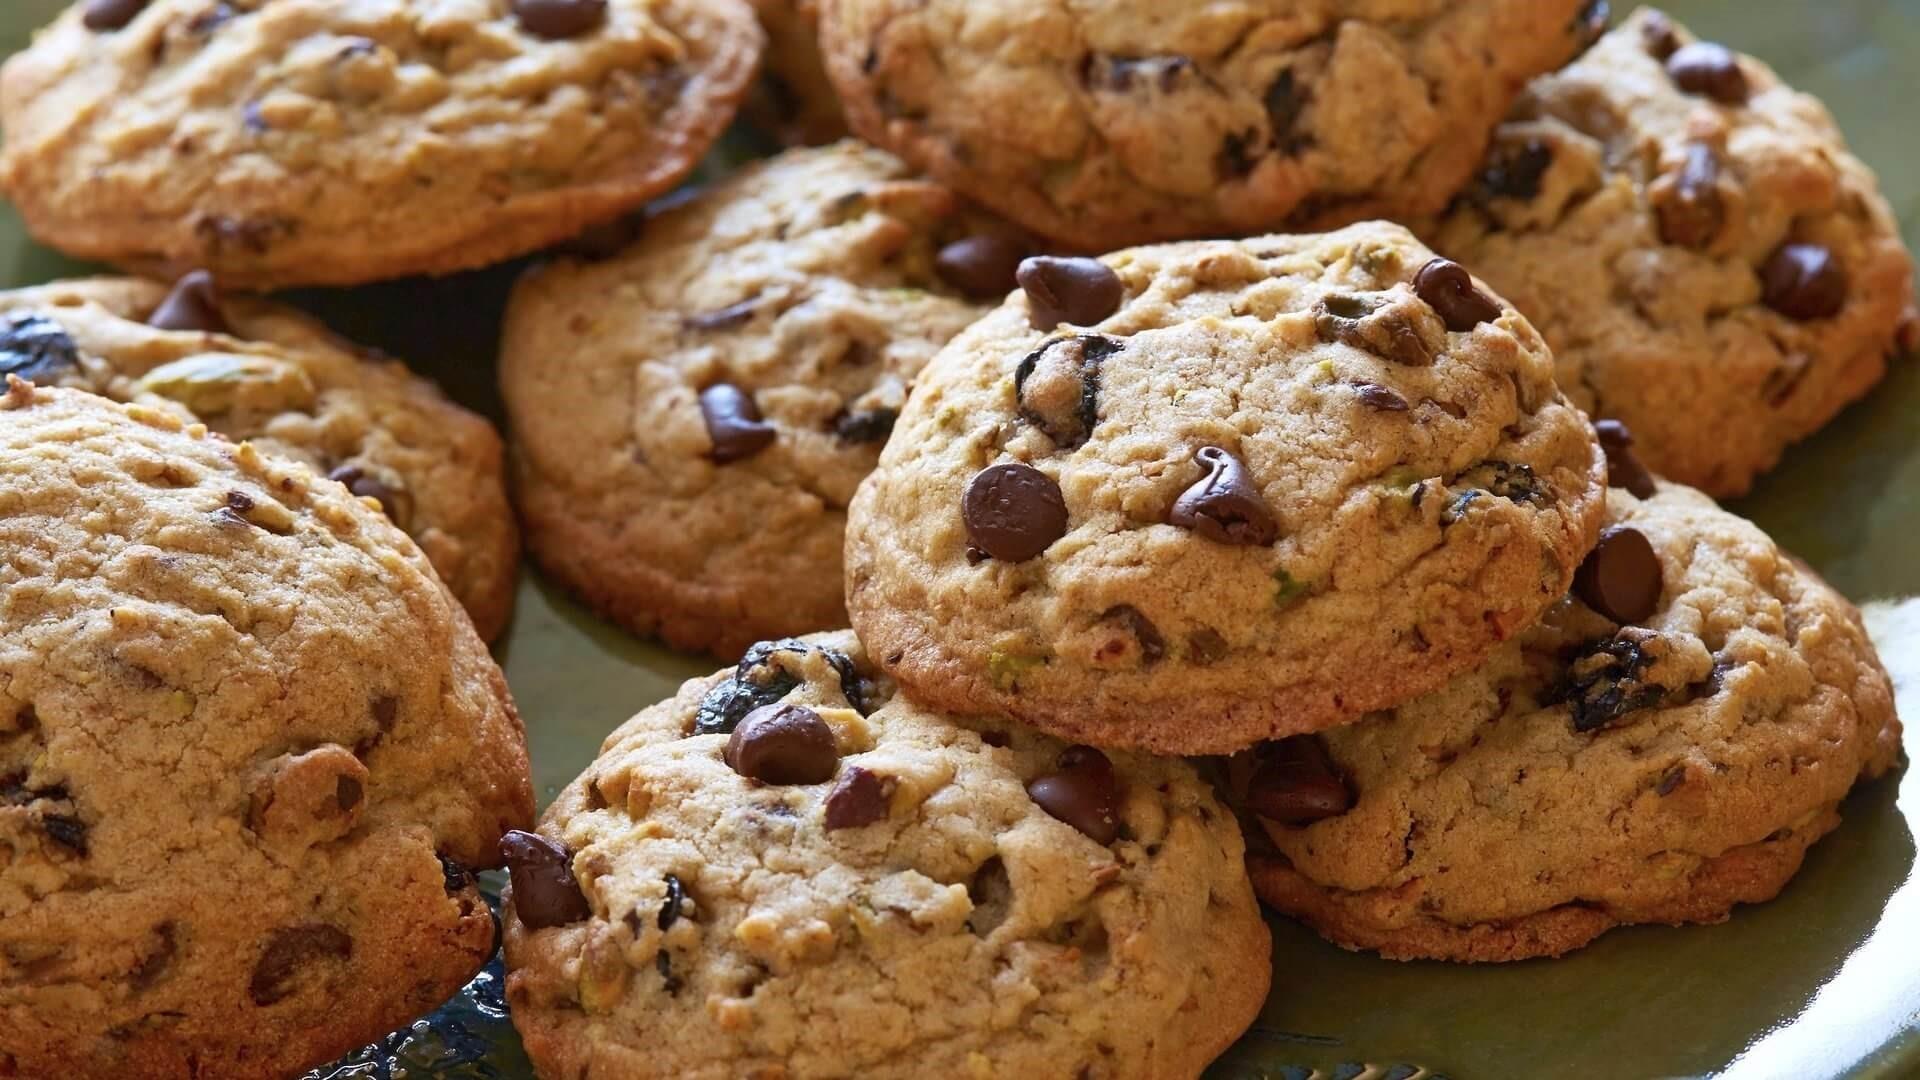 Cookies wallpaper photo hd